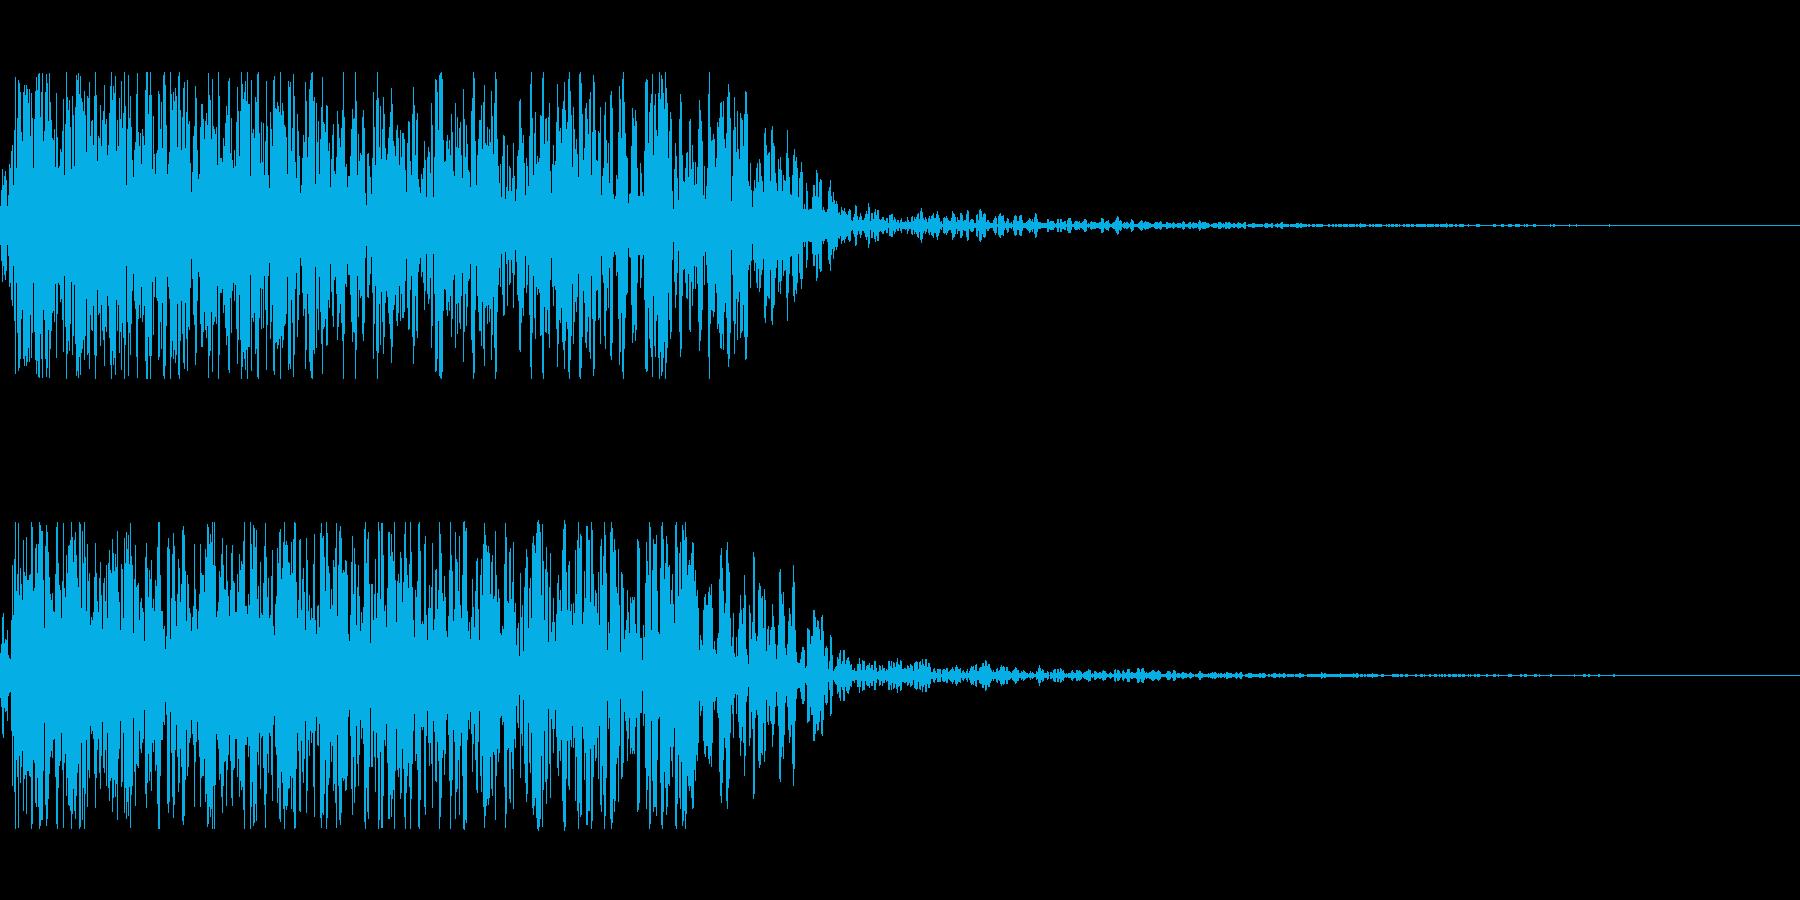 THE 爆破の再生済みの波形